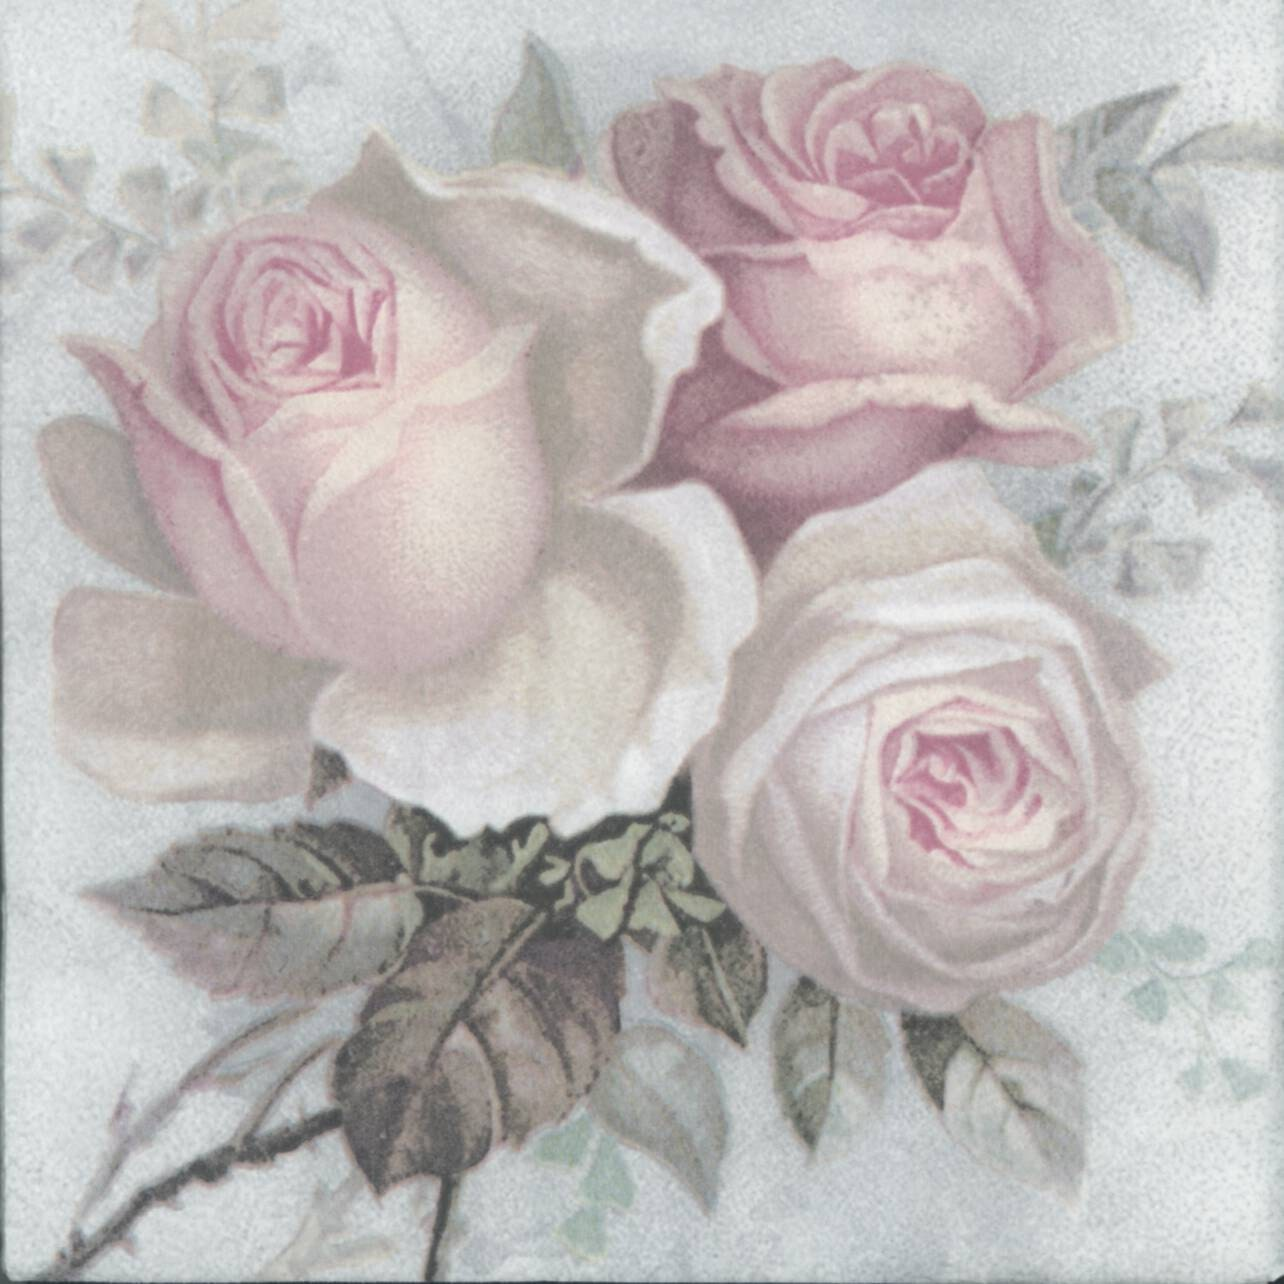 4 decoupage napkins large pastel rose bouquet rose napkins